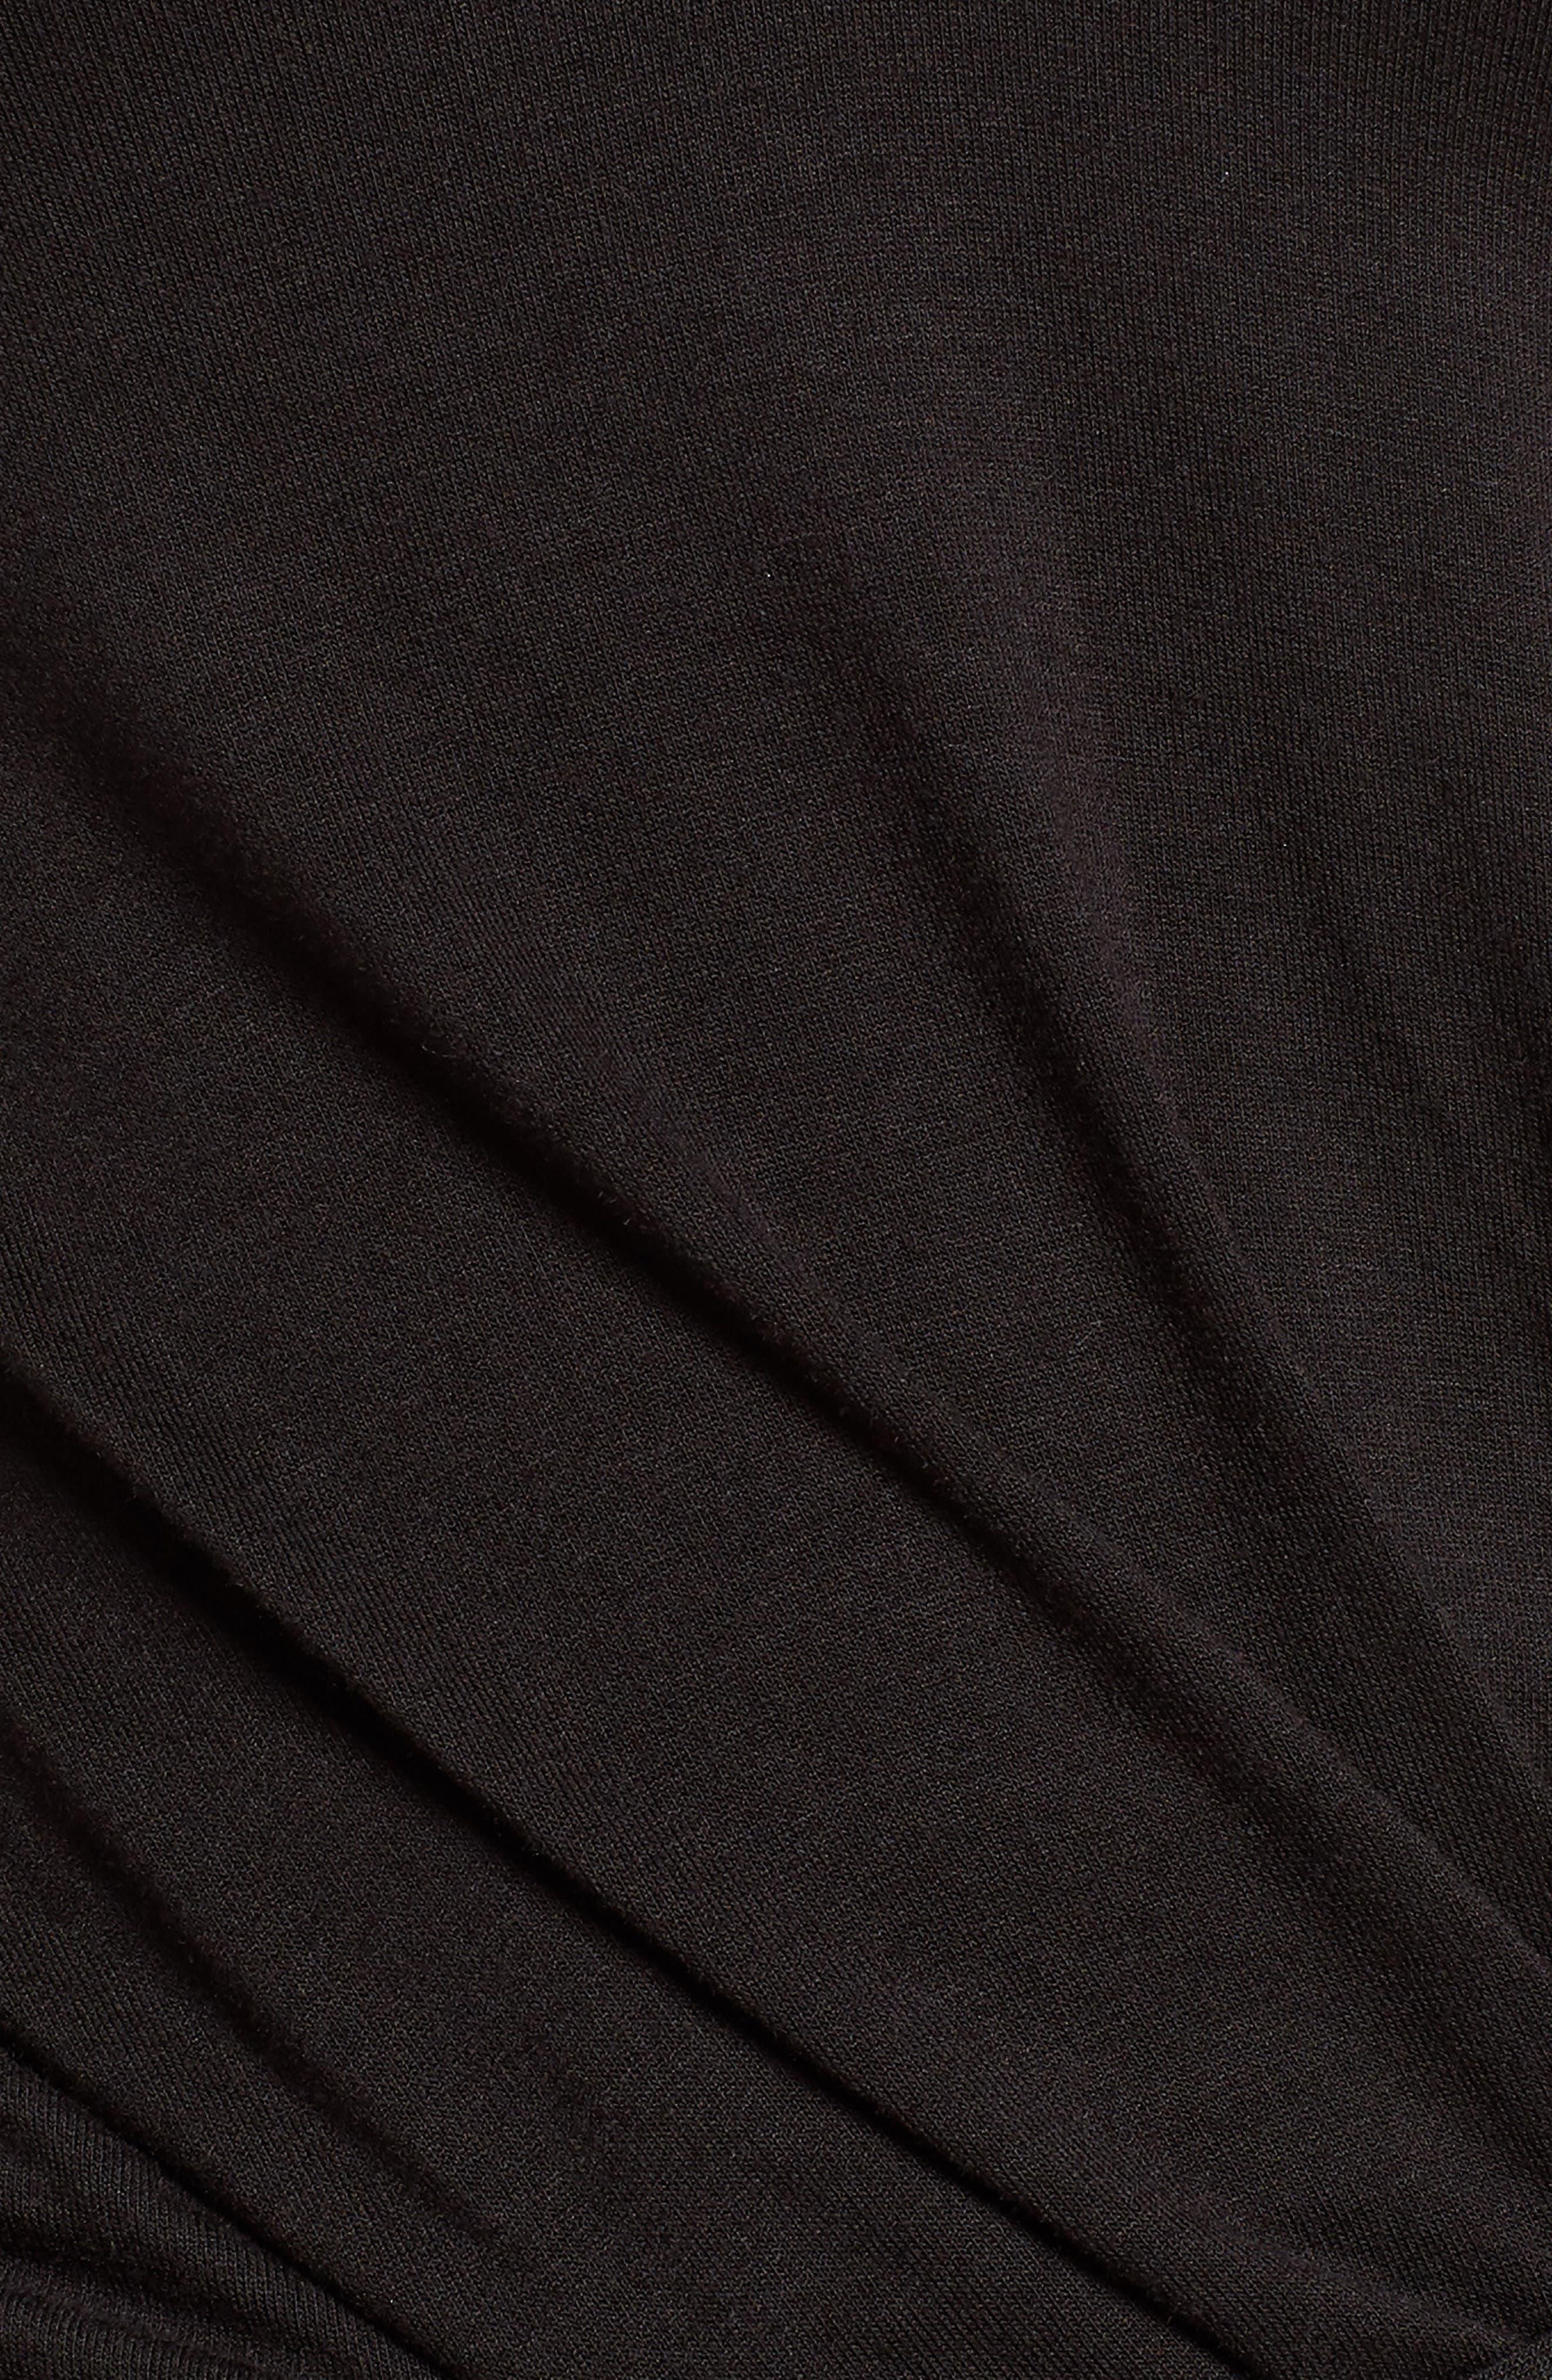 V-Neck Dress,                             Alternate thumbnail 6, color,                             Black Multi